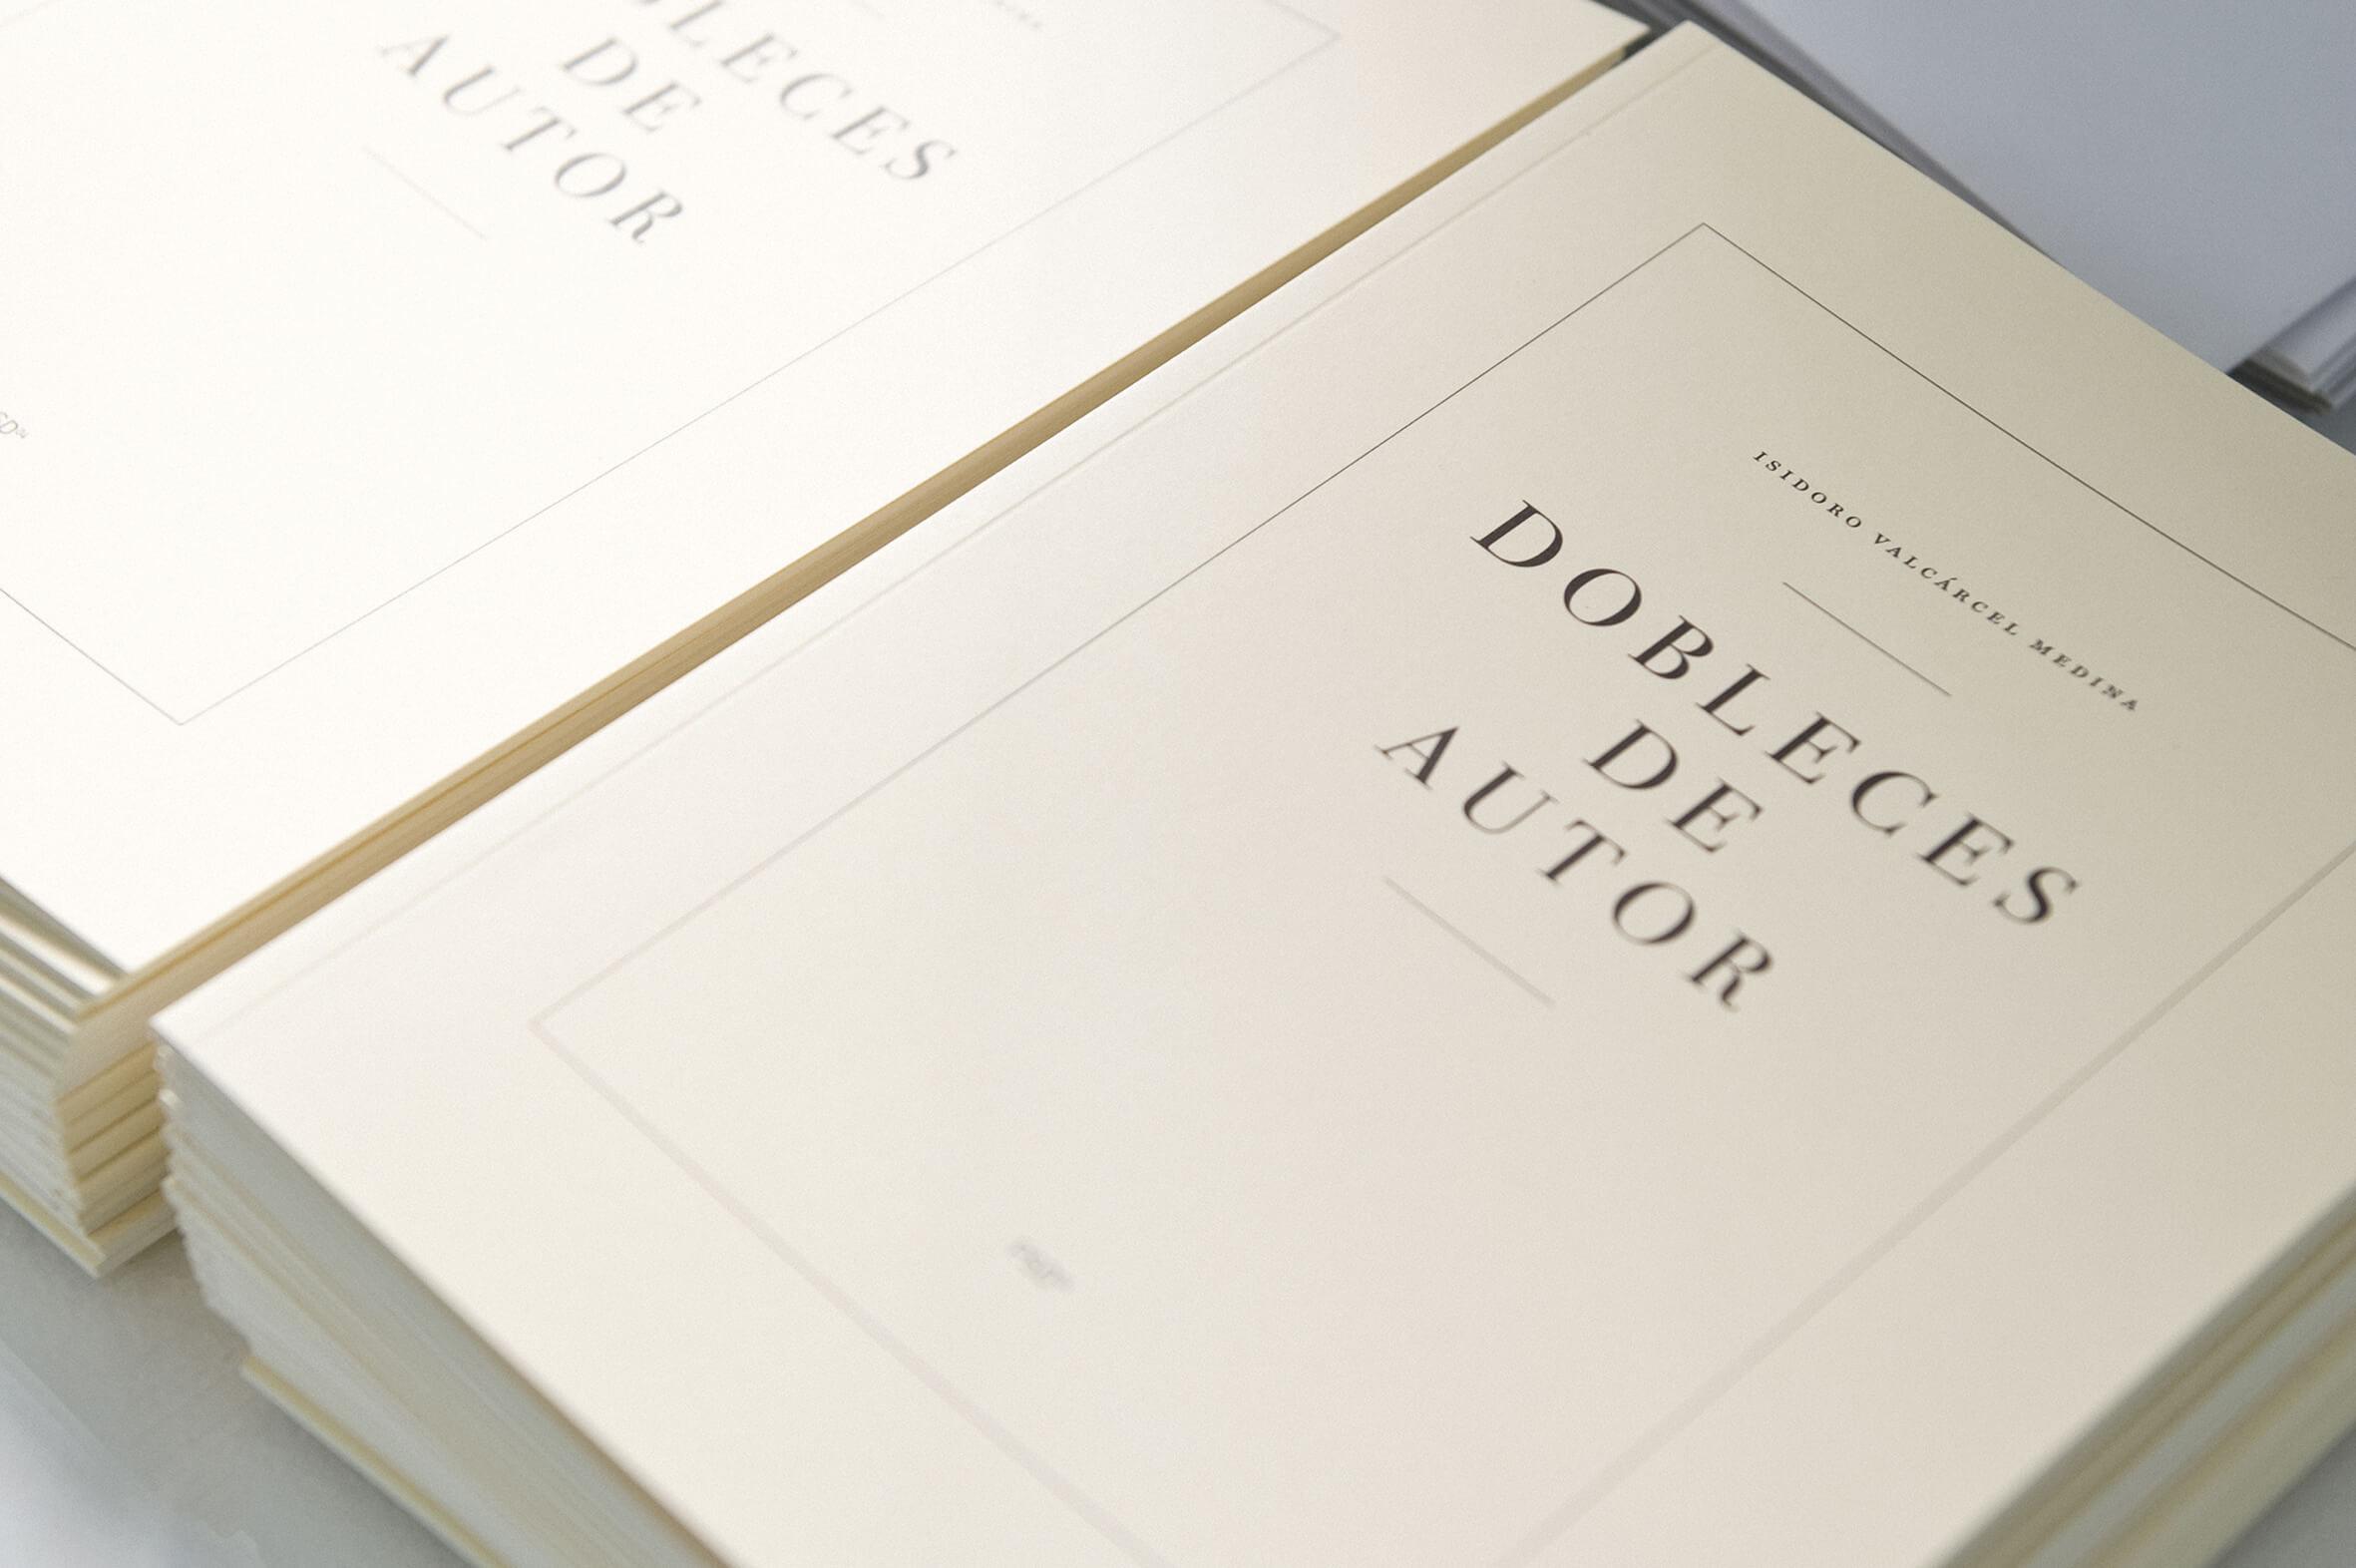 Book Dobleces de Autor.Vostè Mateix, ProjecteSD, Barcelona, 2013 | Vostè Mateix | ProjecteSD